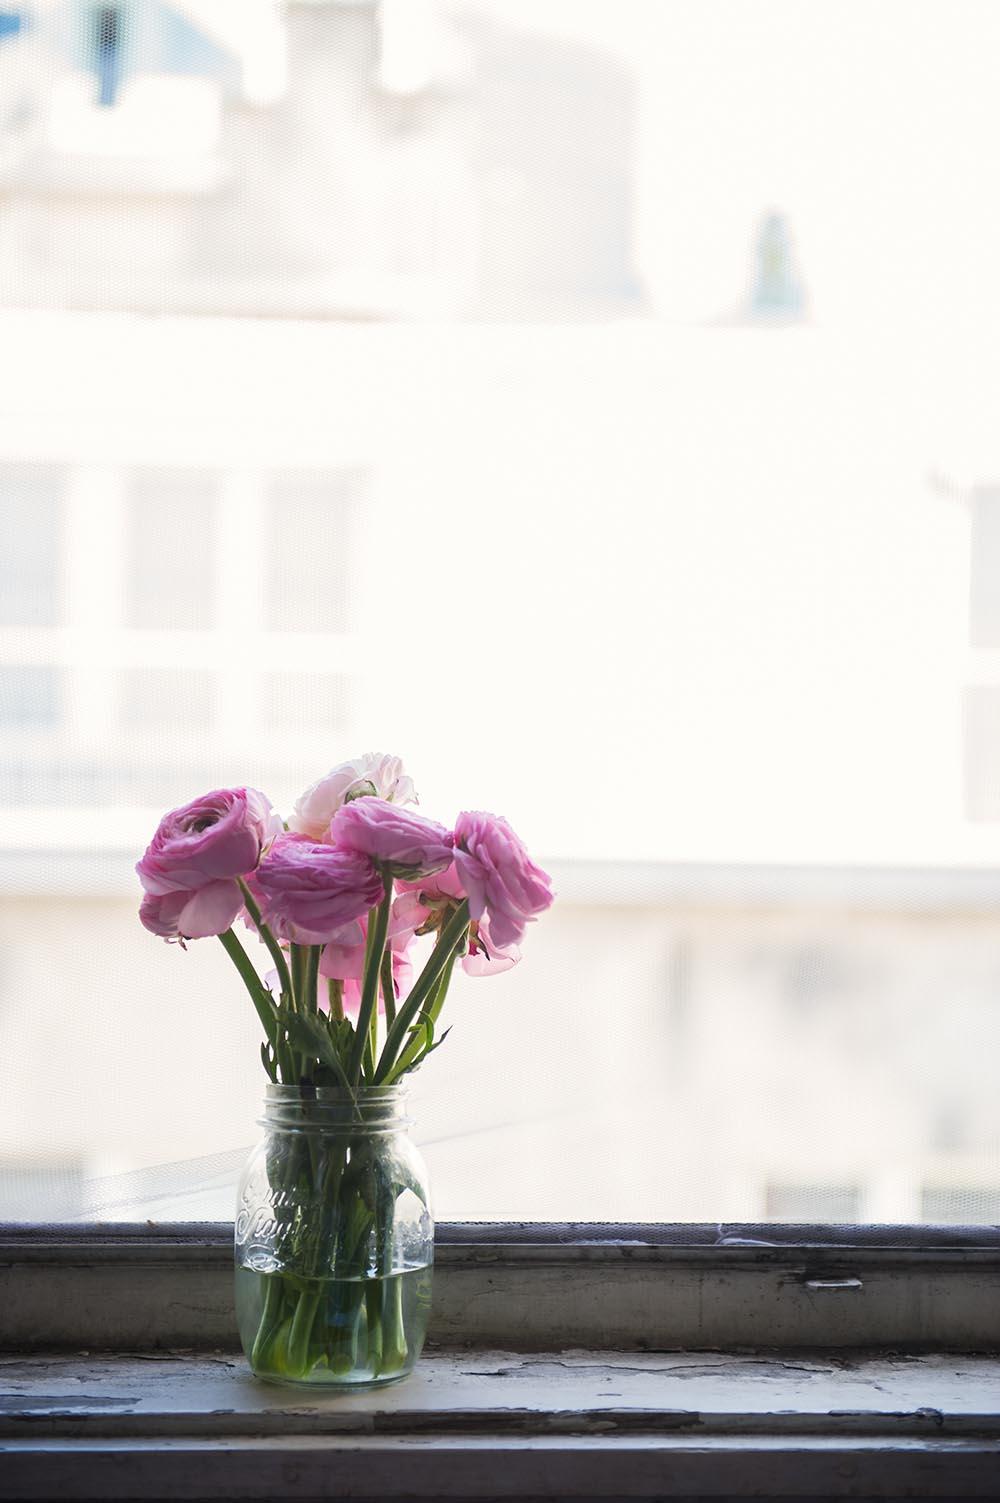 ranunkeln, ranunculus, buttercups, pink, flowers, spring, window